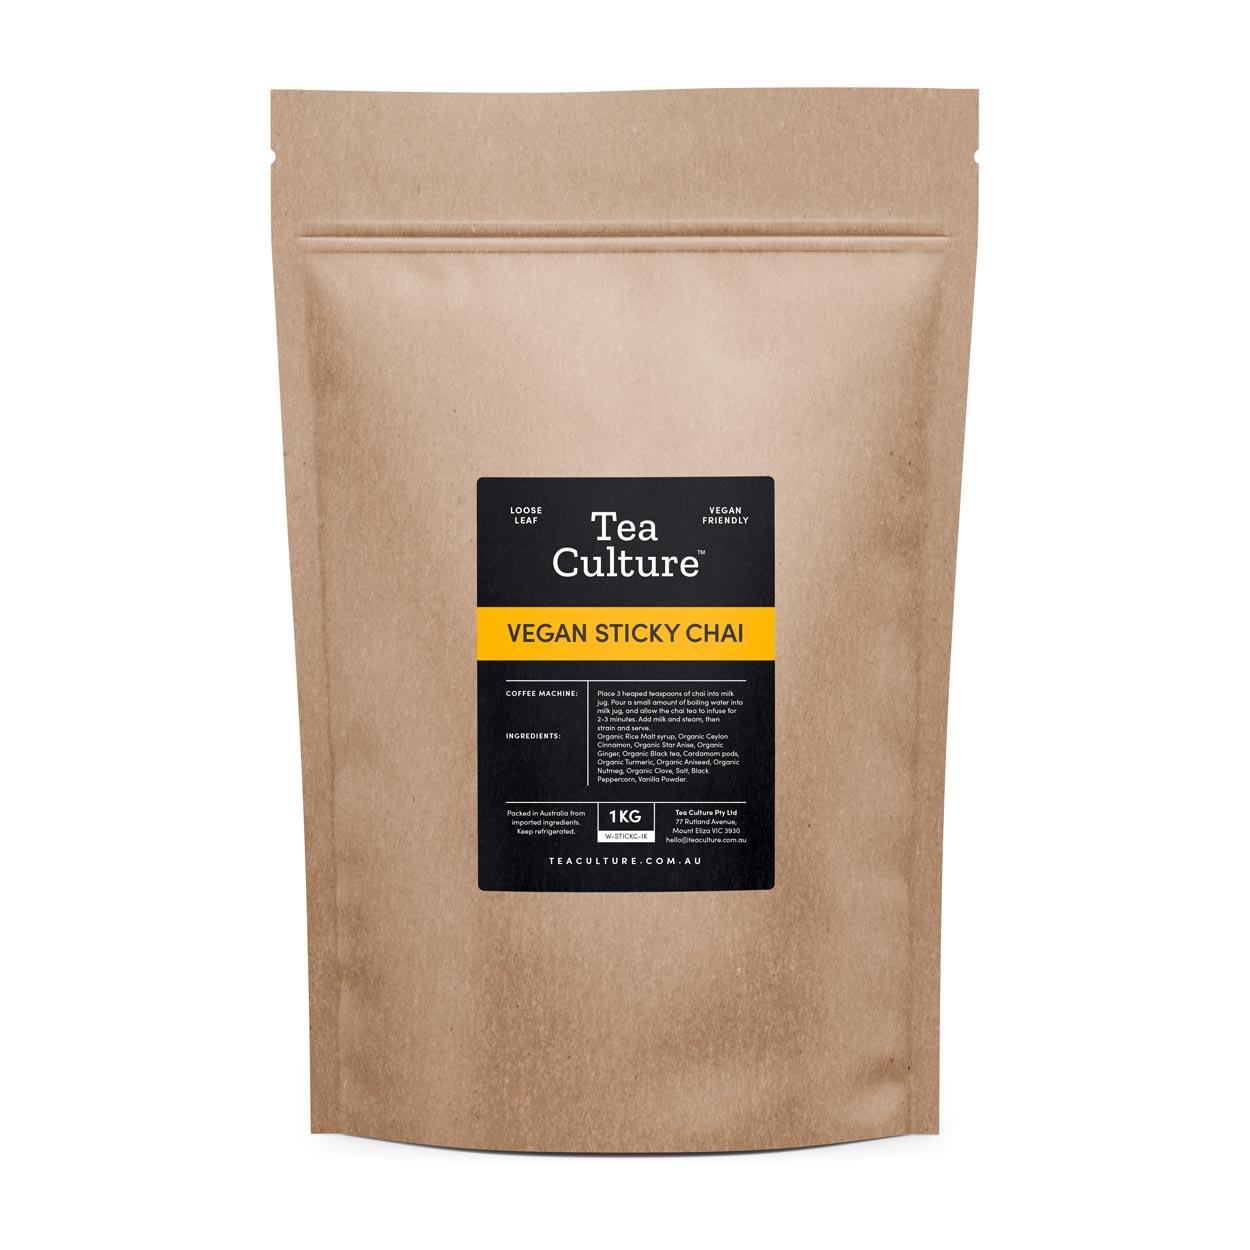 Tea Culture™ Vegan Sticky Chai 1KG